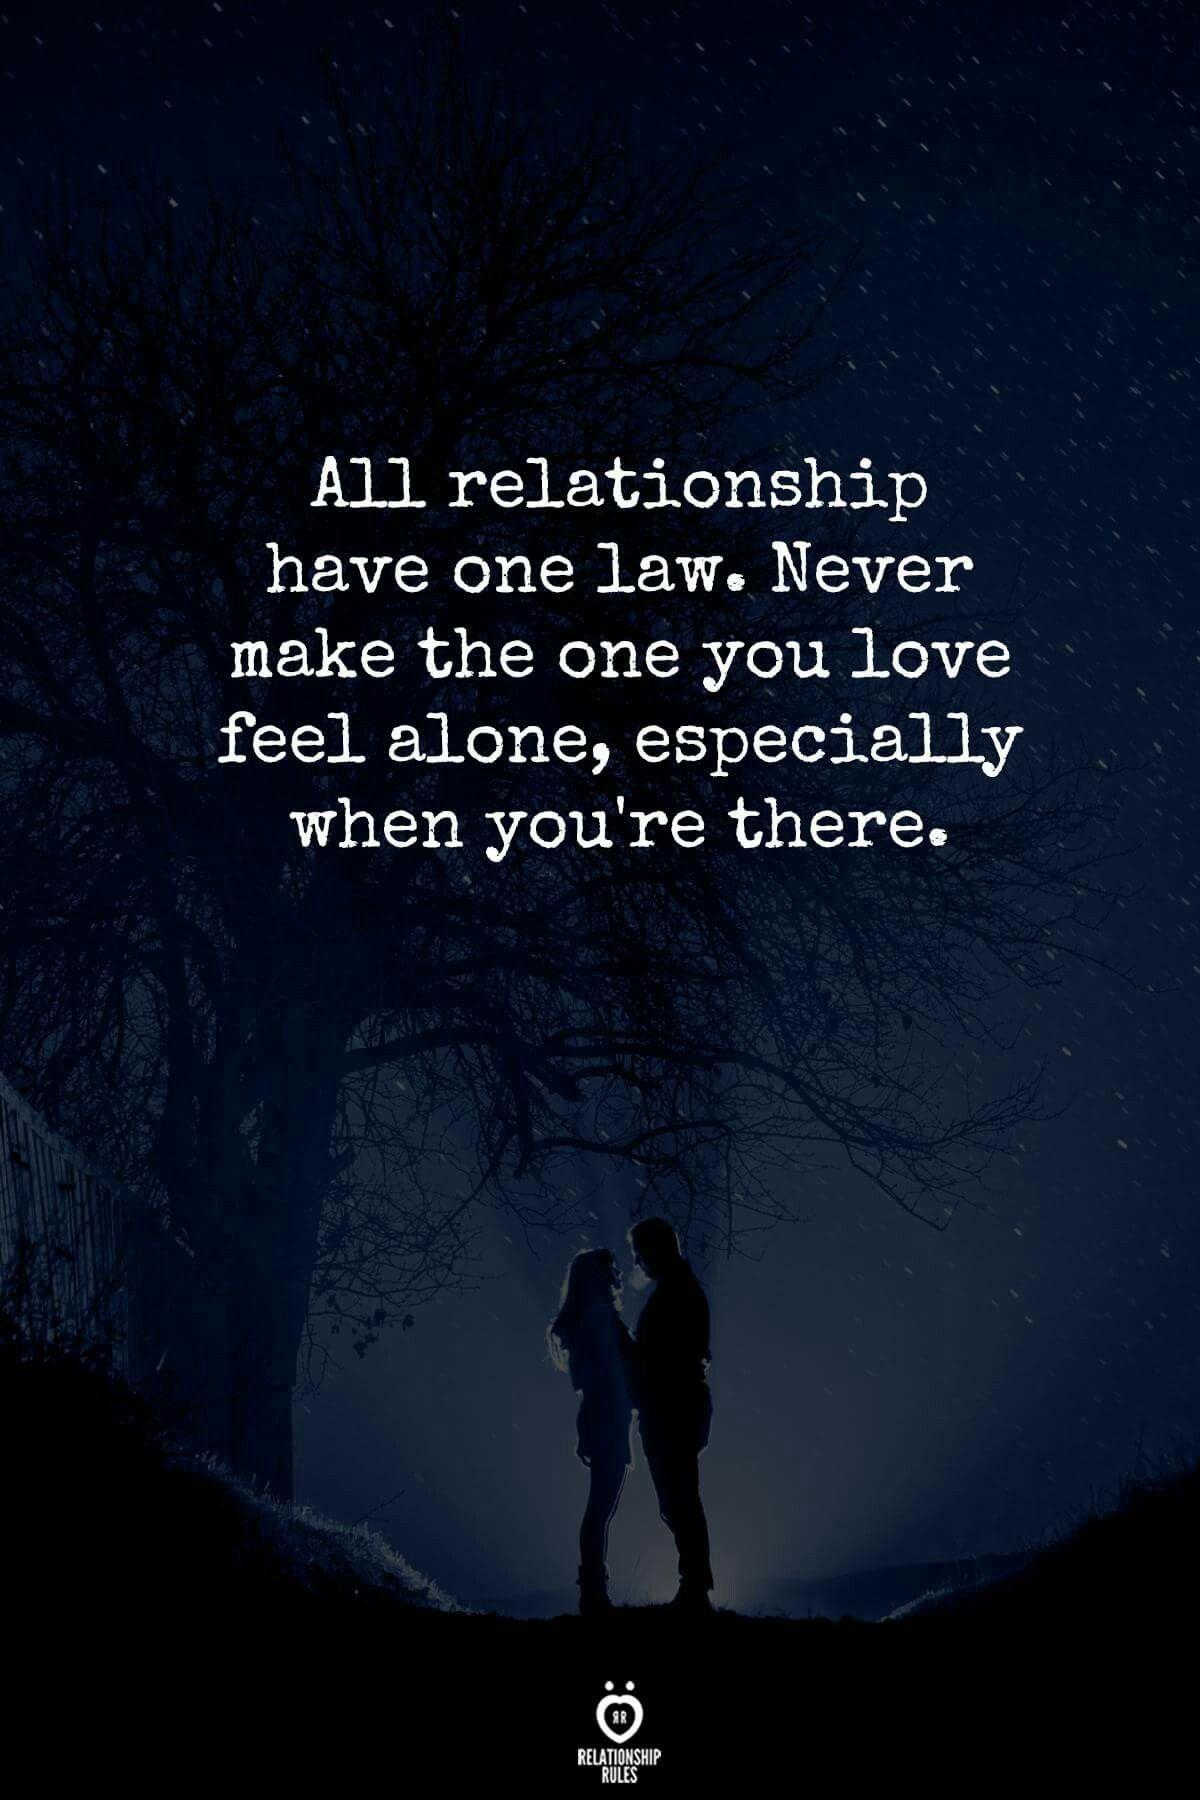 Pin by Kaur on Healing/Self love | Relationship advice